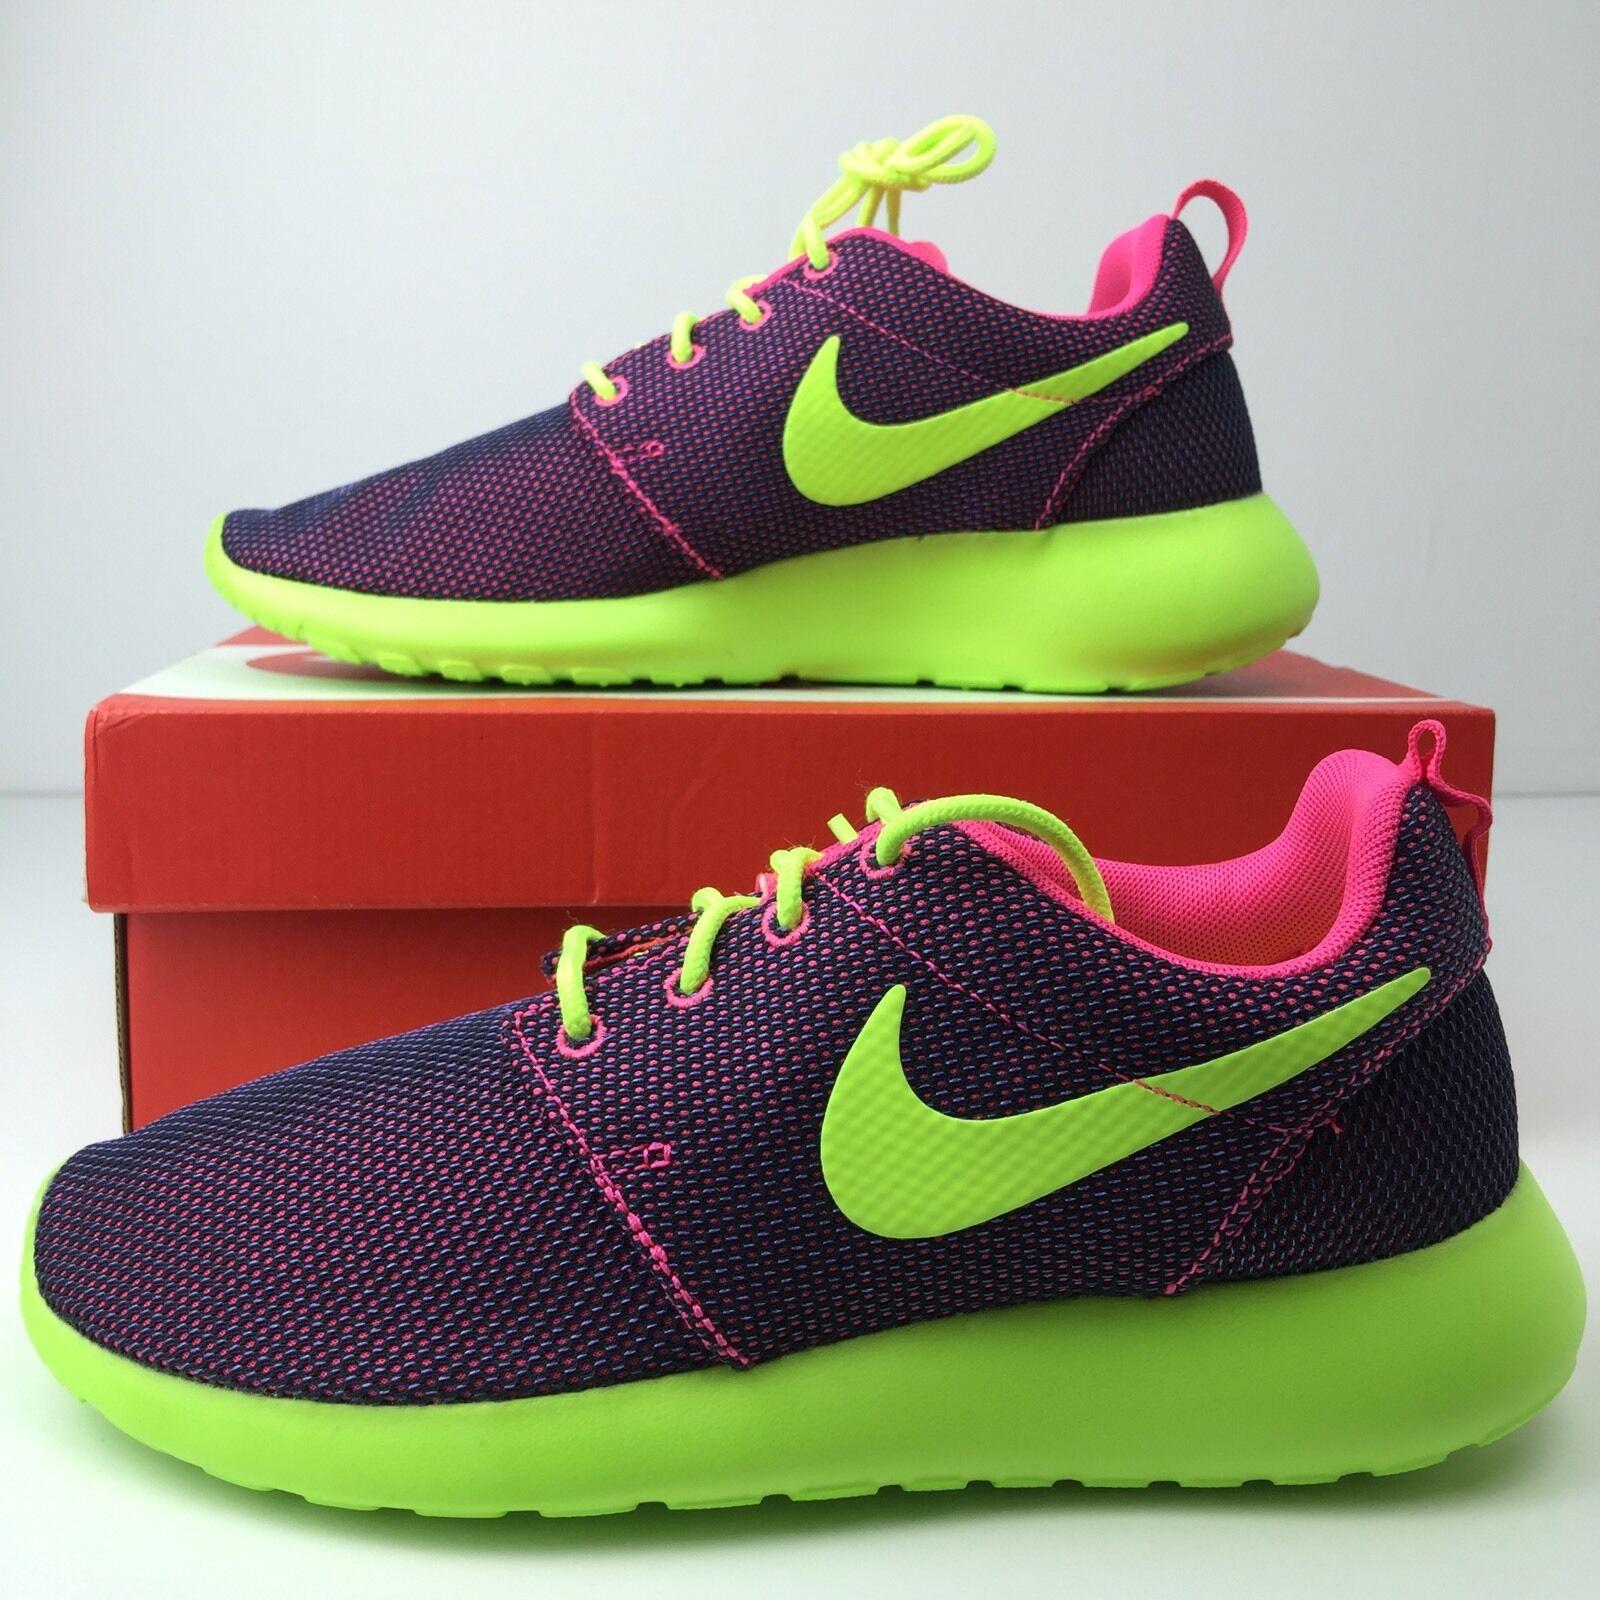 Nike Rosherun para correr roshe formadores Para Mujer Chicas zapatos Reino Unido 4